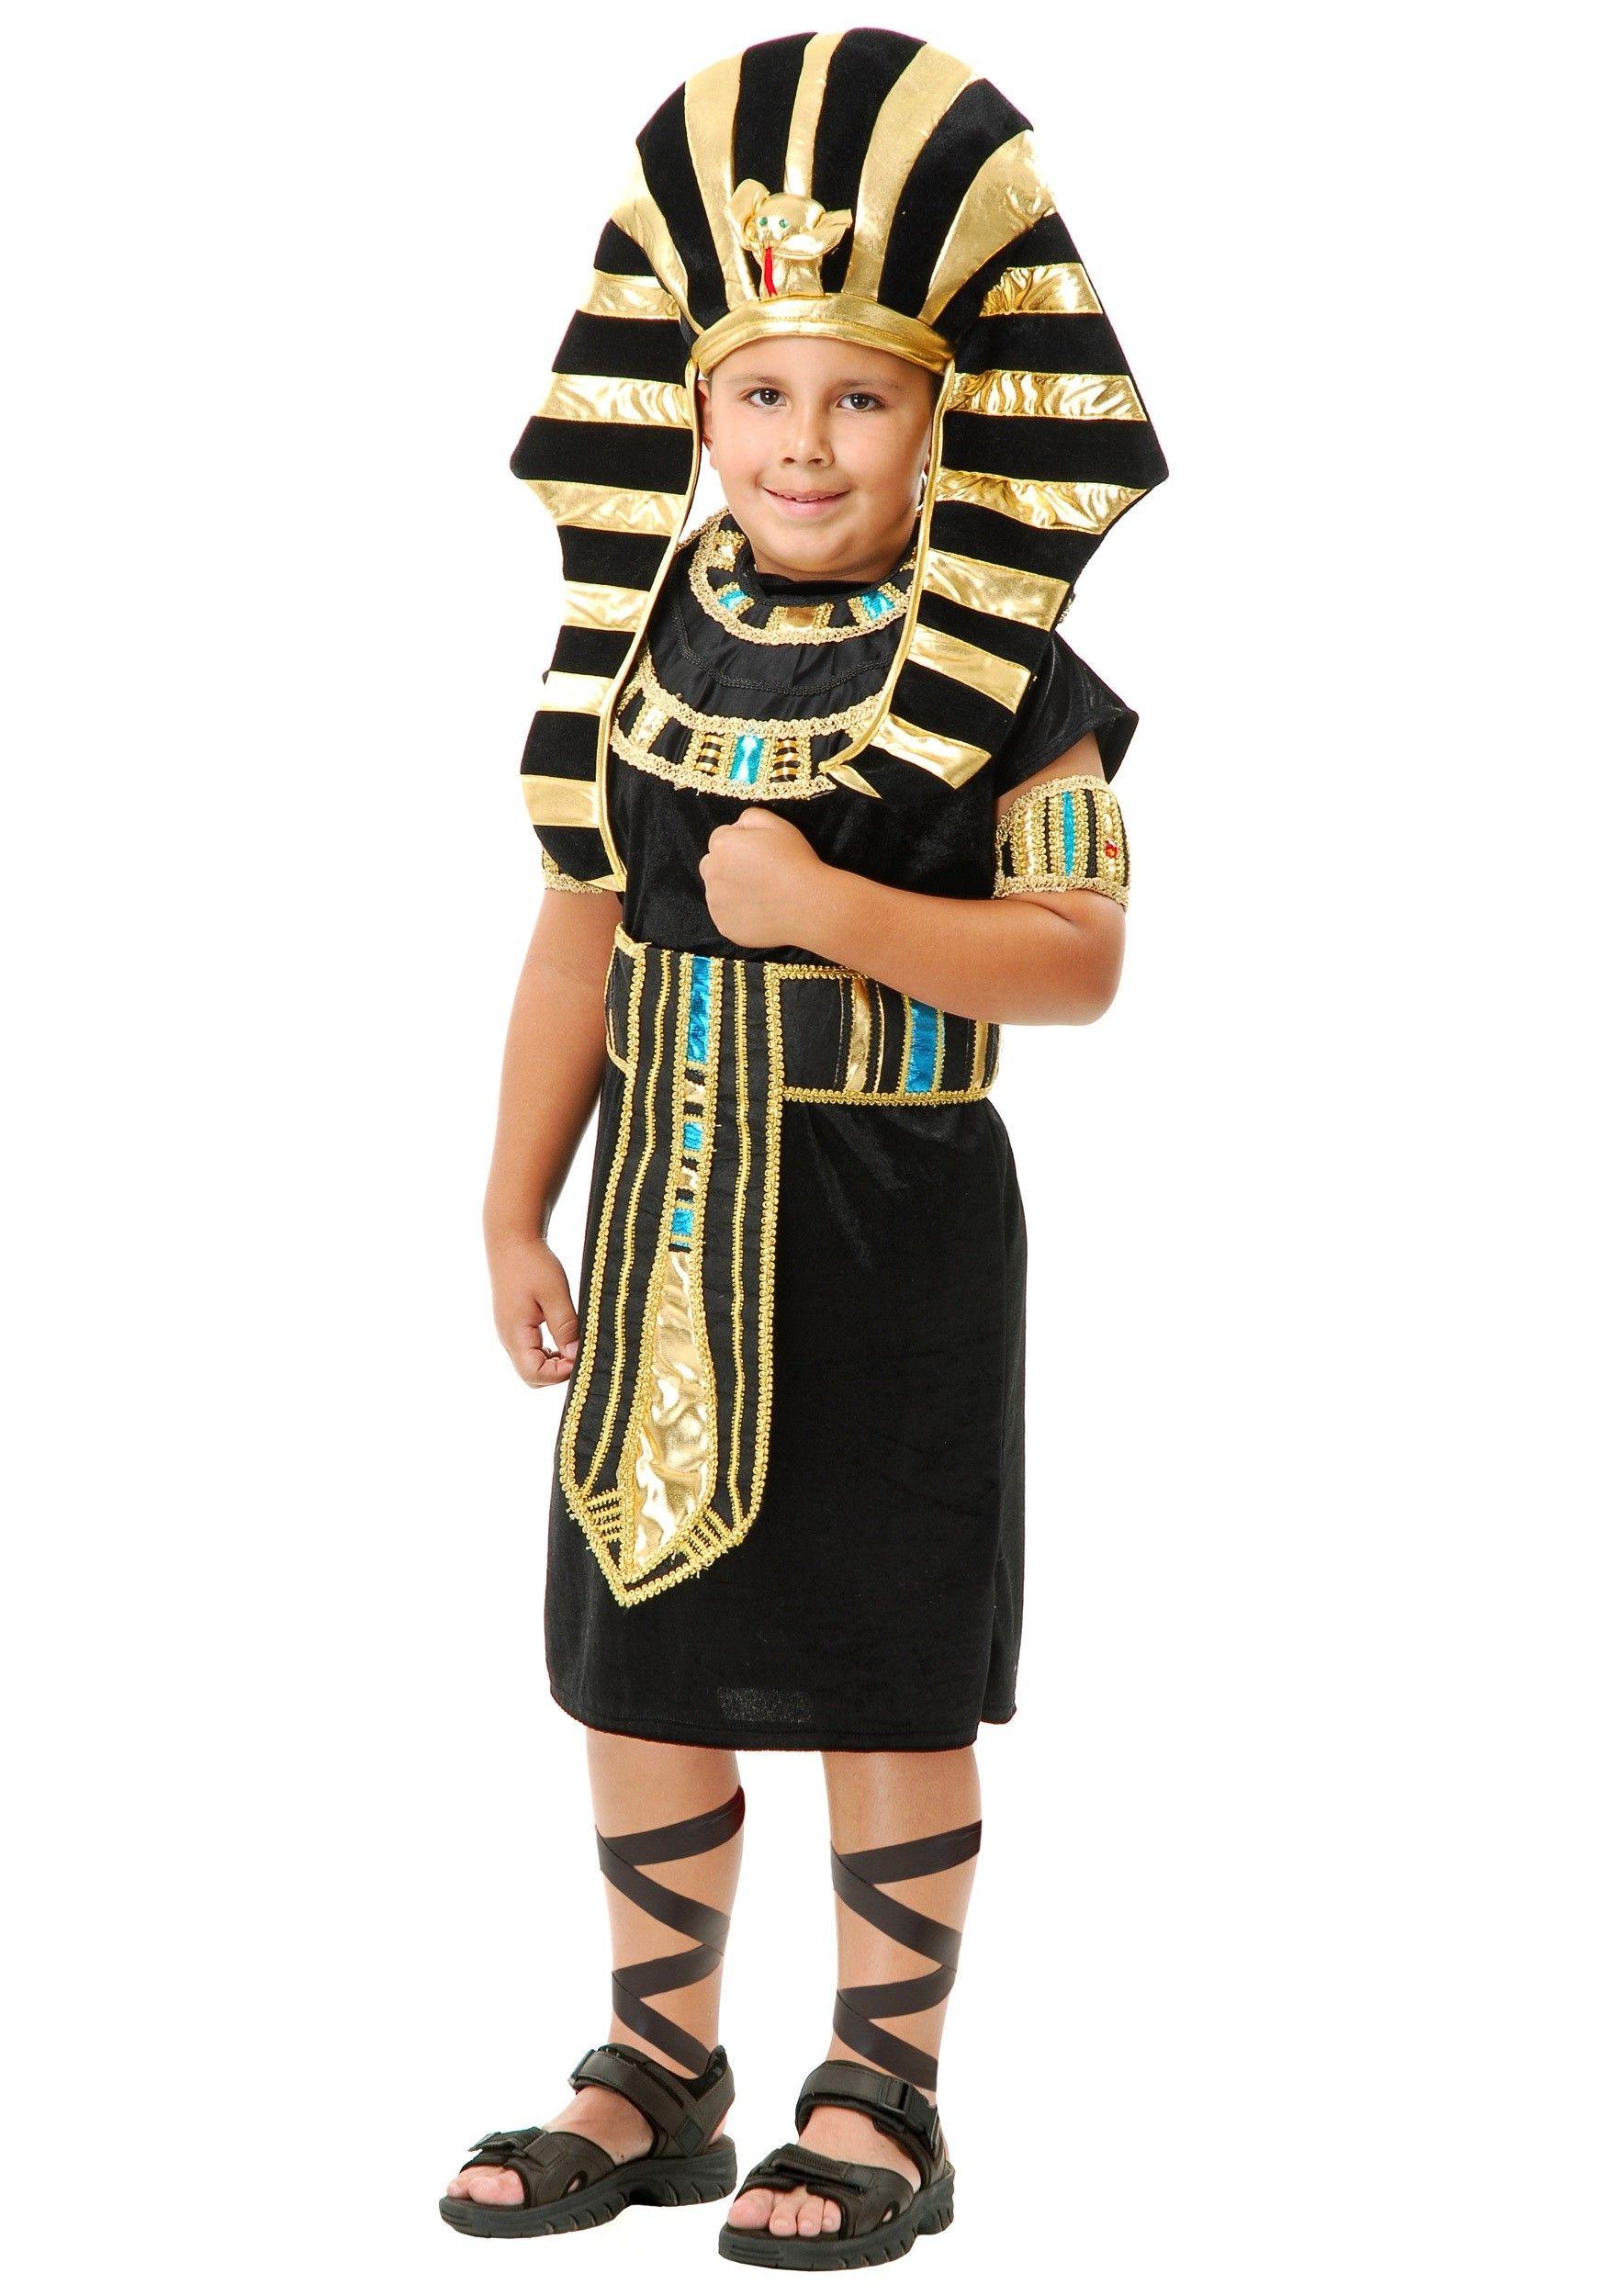 57558deb3 Fantasia Infantil Faraó Egípcio Meninos Halloween Carnaval